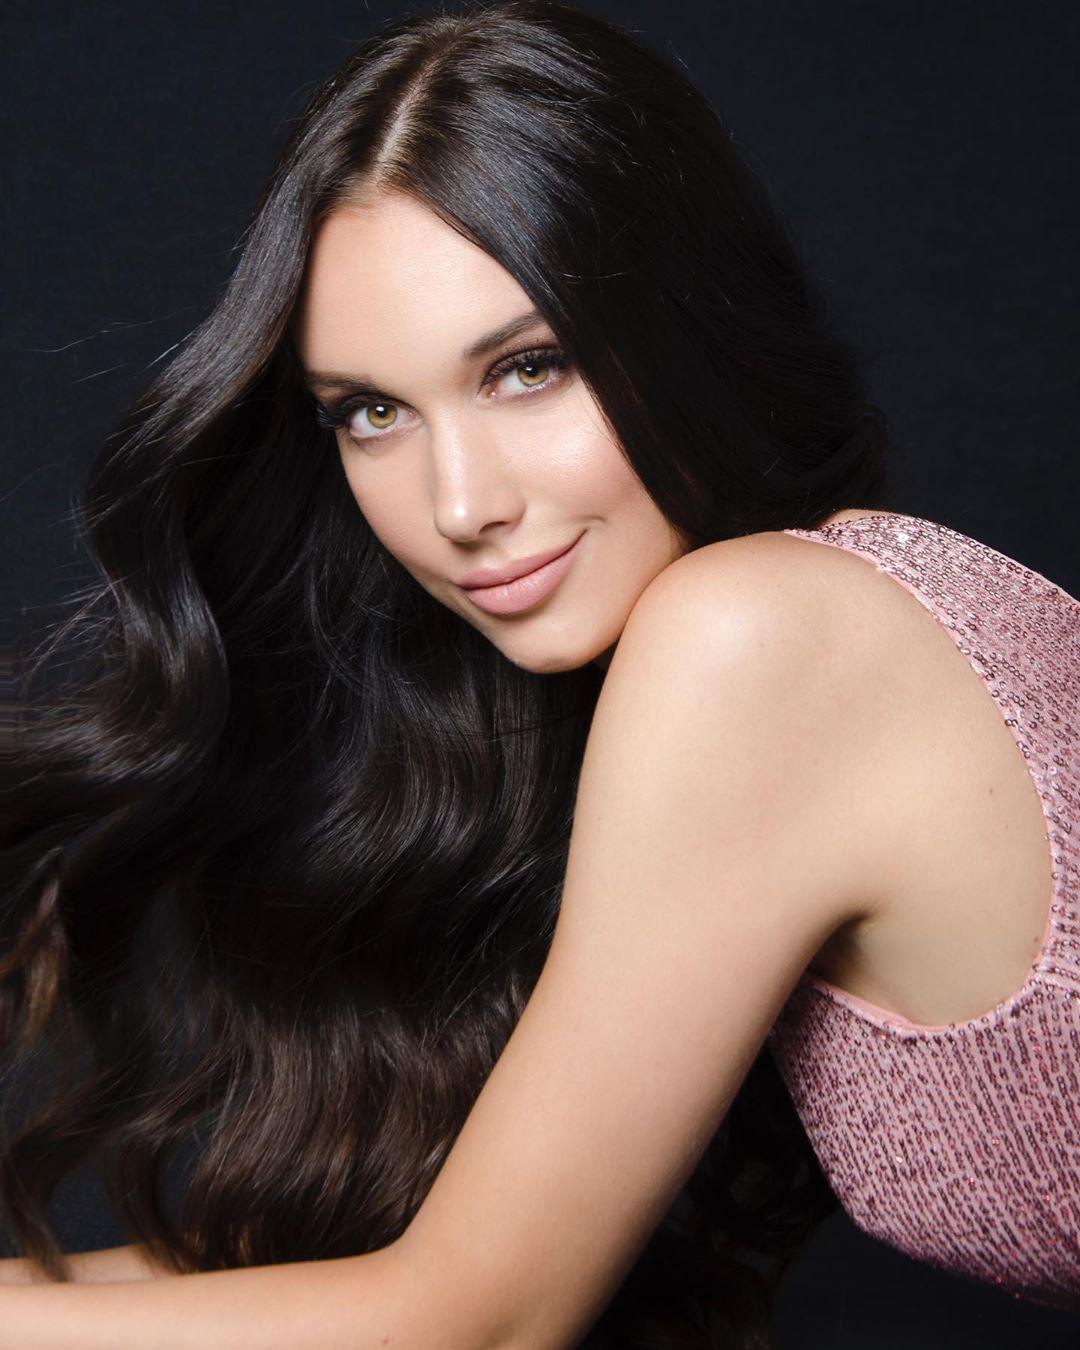 candidatas a miss universe spain 2019. final: 18 sept. - Página 4 1Lyfjx